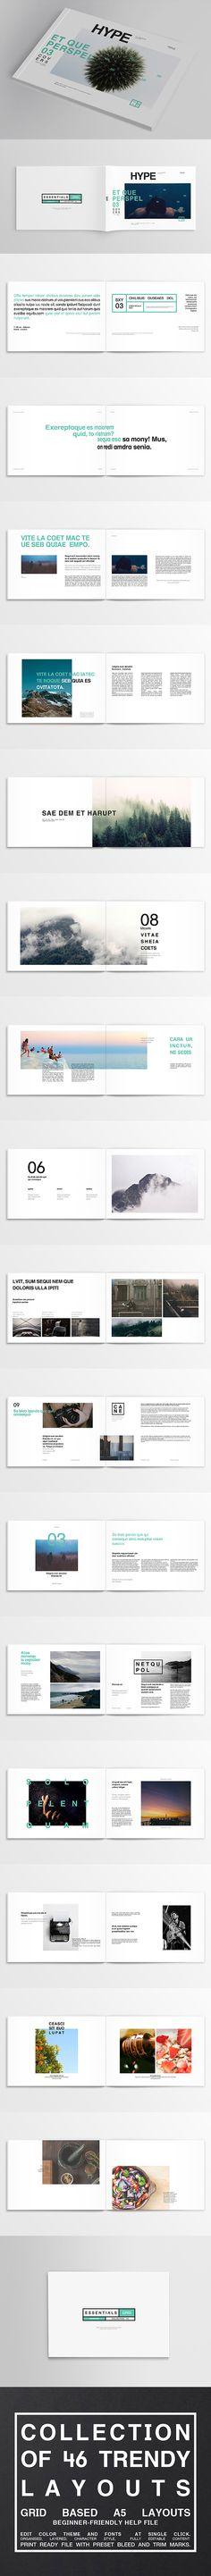 http://graphicriver.net/item/46-essential-trendy-layout-set-magazine-brochure/10978821